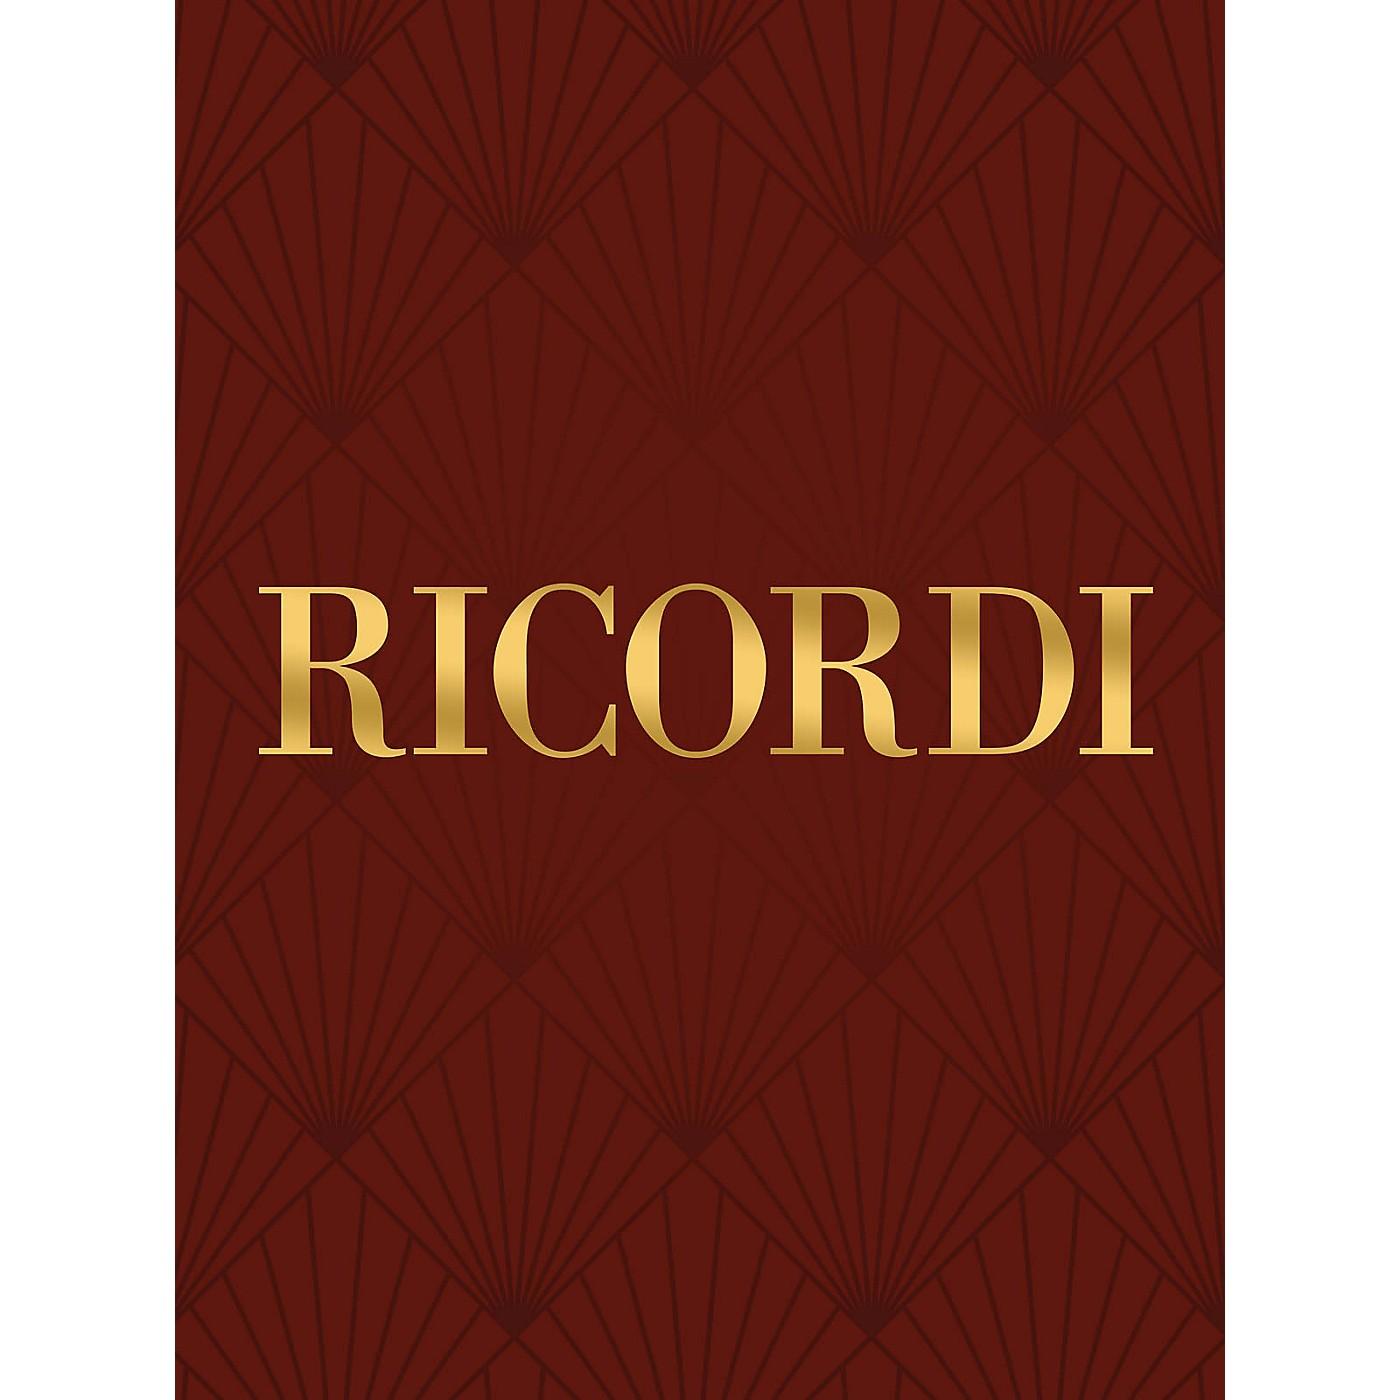 Ricordi Conspirators' Chorus from Rigoletto Verdi TTBB (Choral) thumbnail